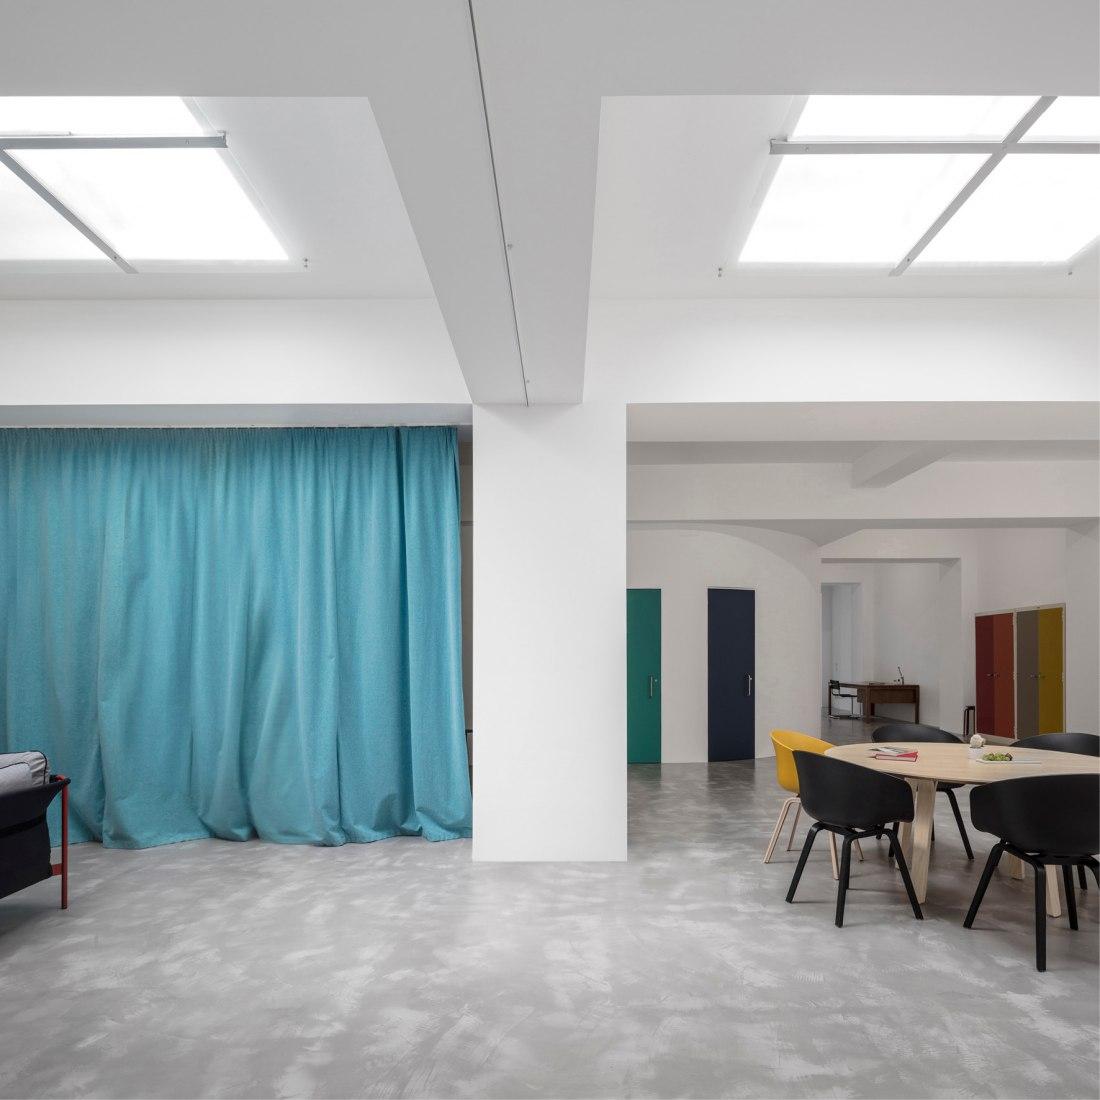 De garaje a vivienda por Fala Atelier. Fotografía © Fernando Guerra. FG+SG